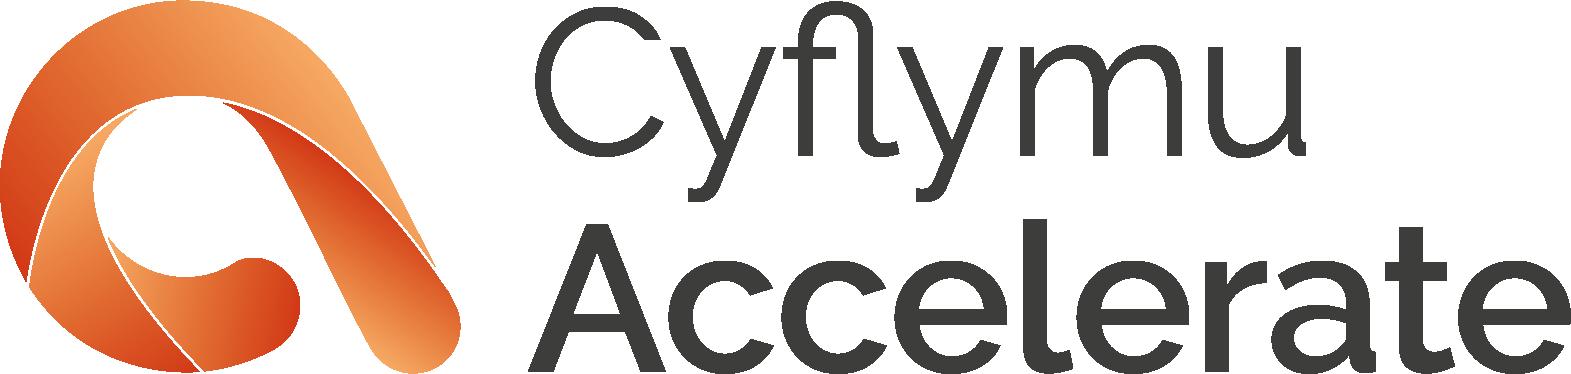 Accelerate-CMYK